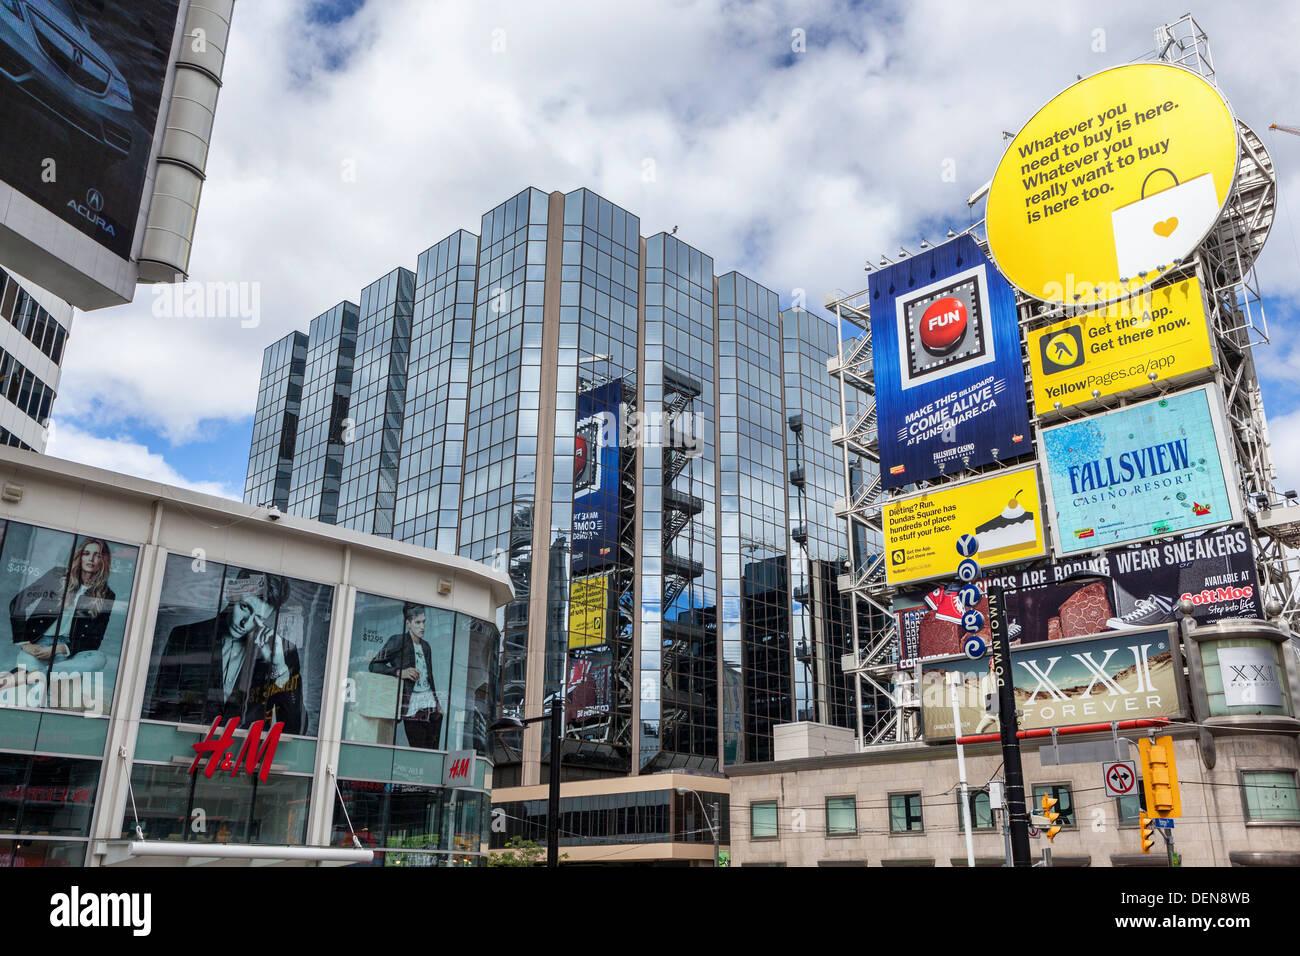 Advertisements and billboards around Dundas Square, Toronto - Stock Image